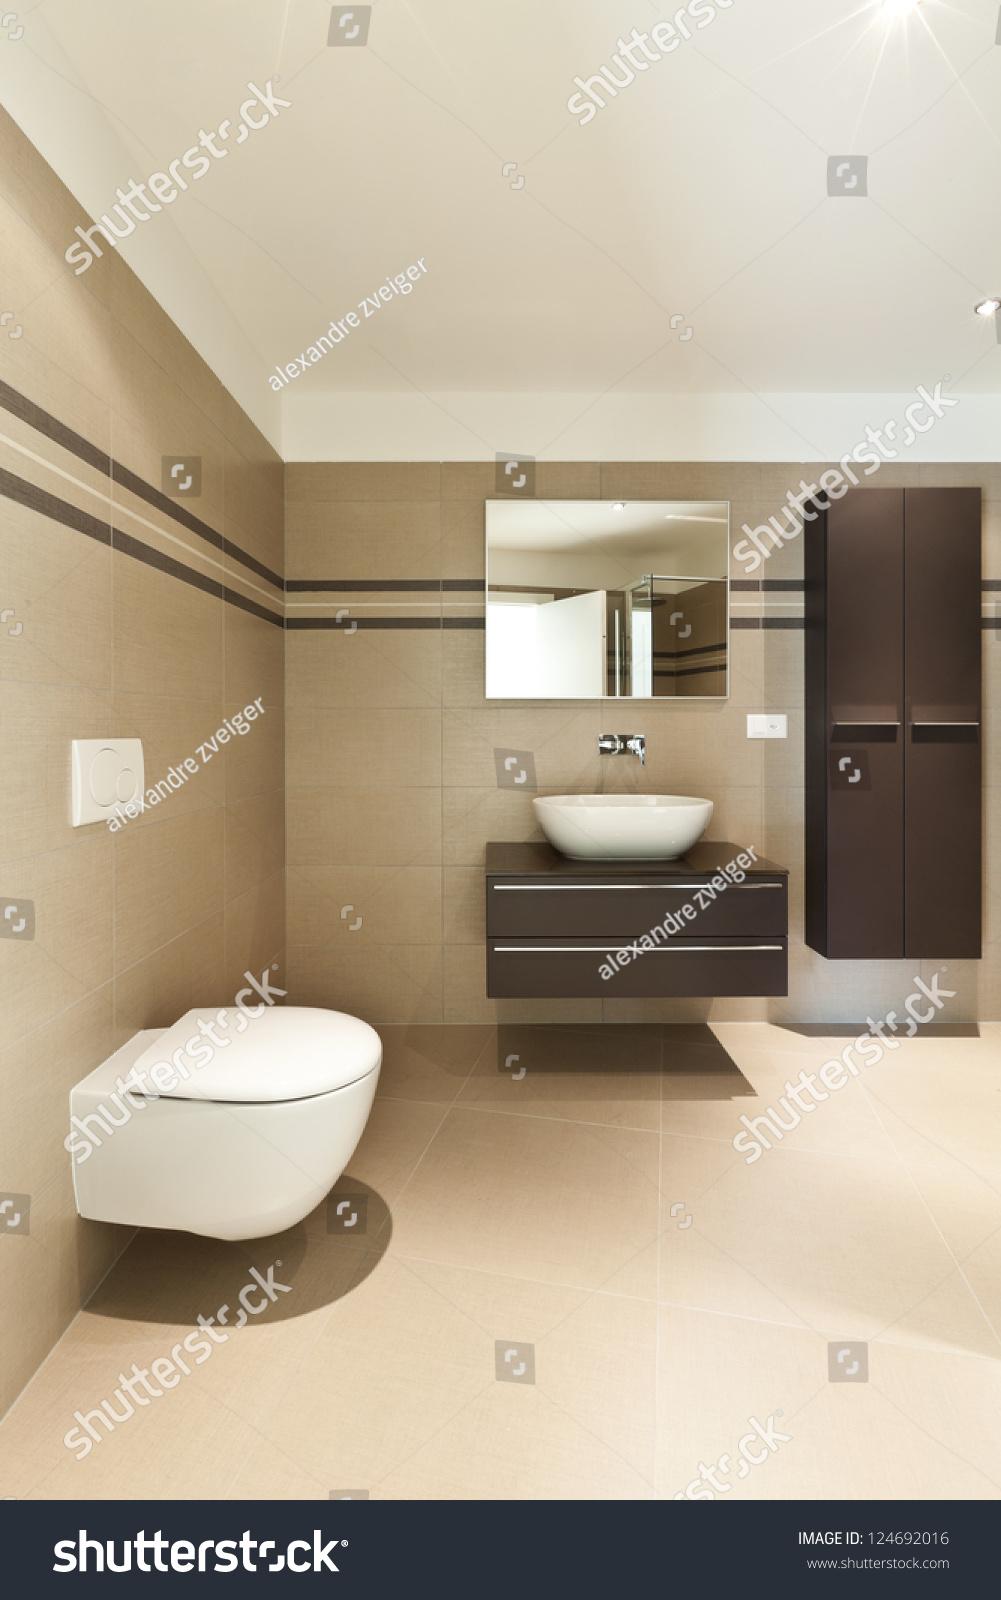 Modern Architecture New Empty Apartment Bathroom Stock Photo 124692016  Shutterstock